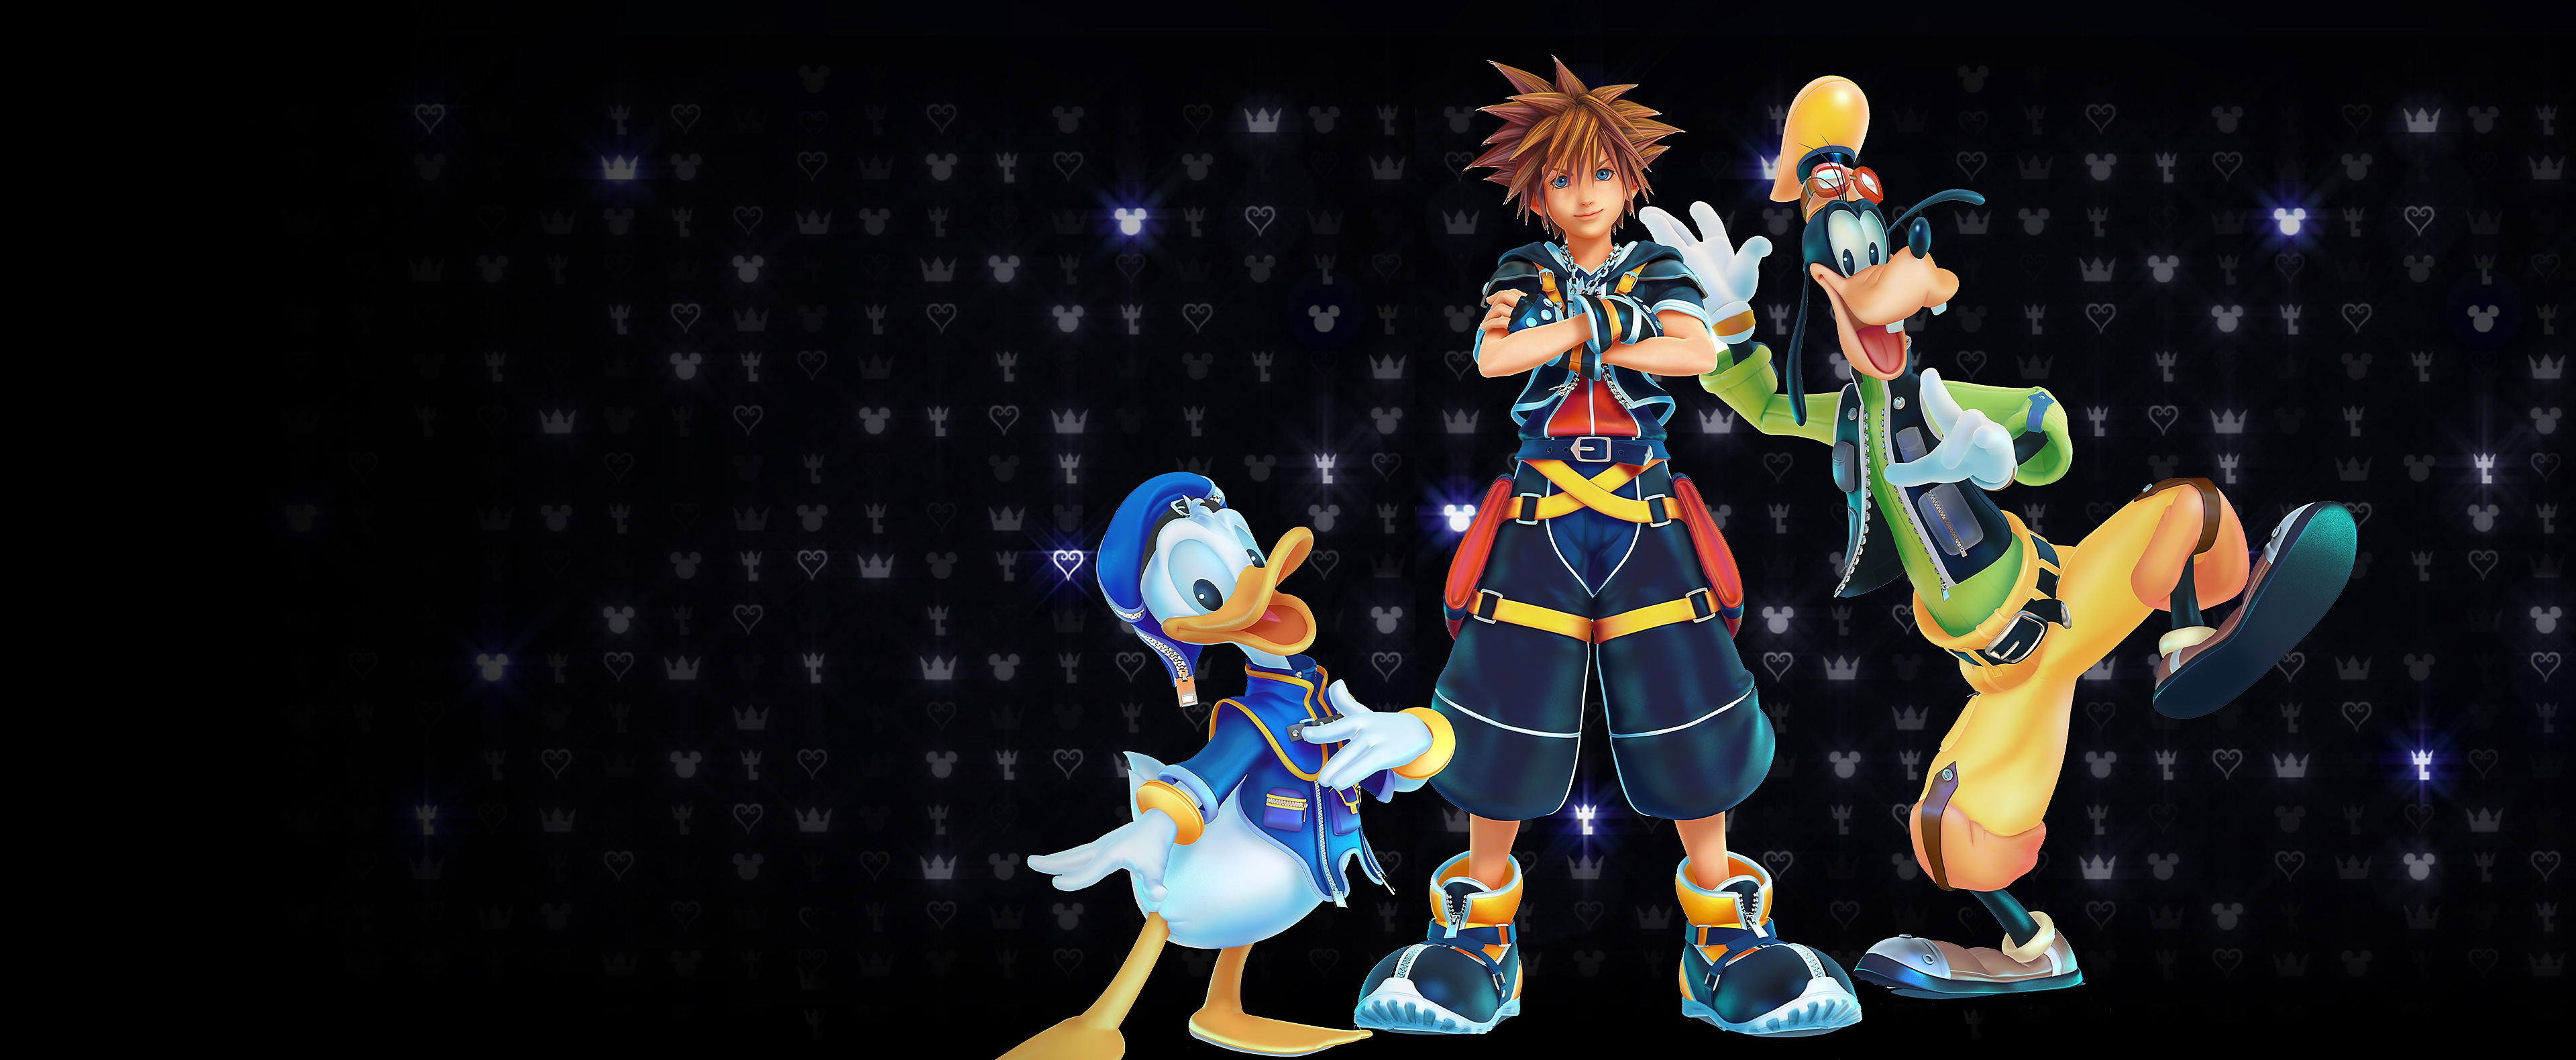 Kingdom HeartsIII